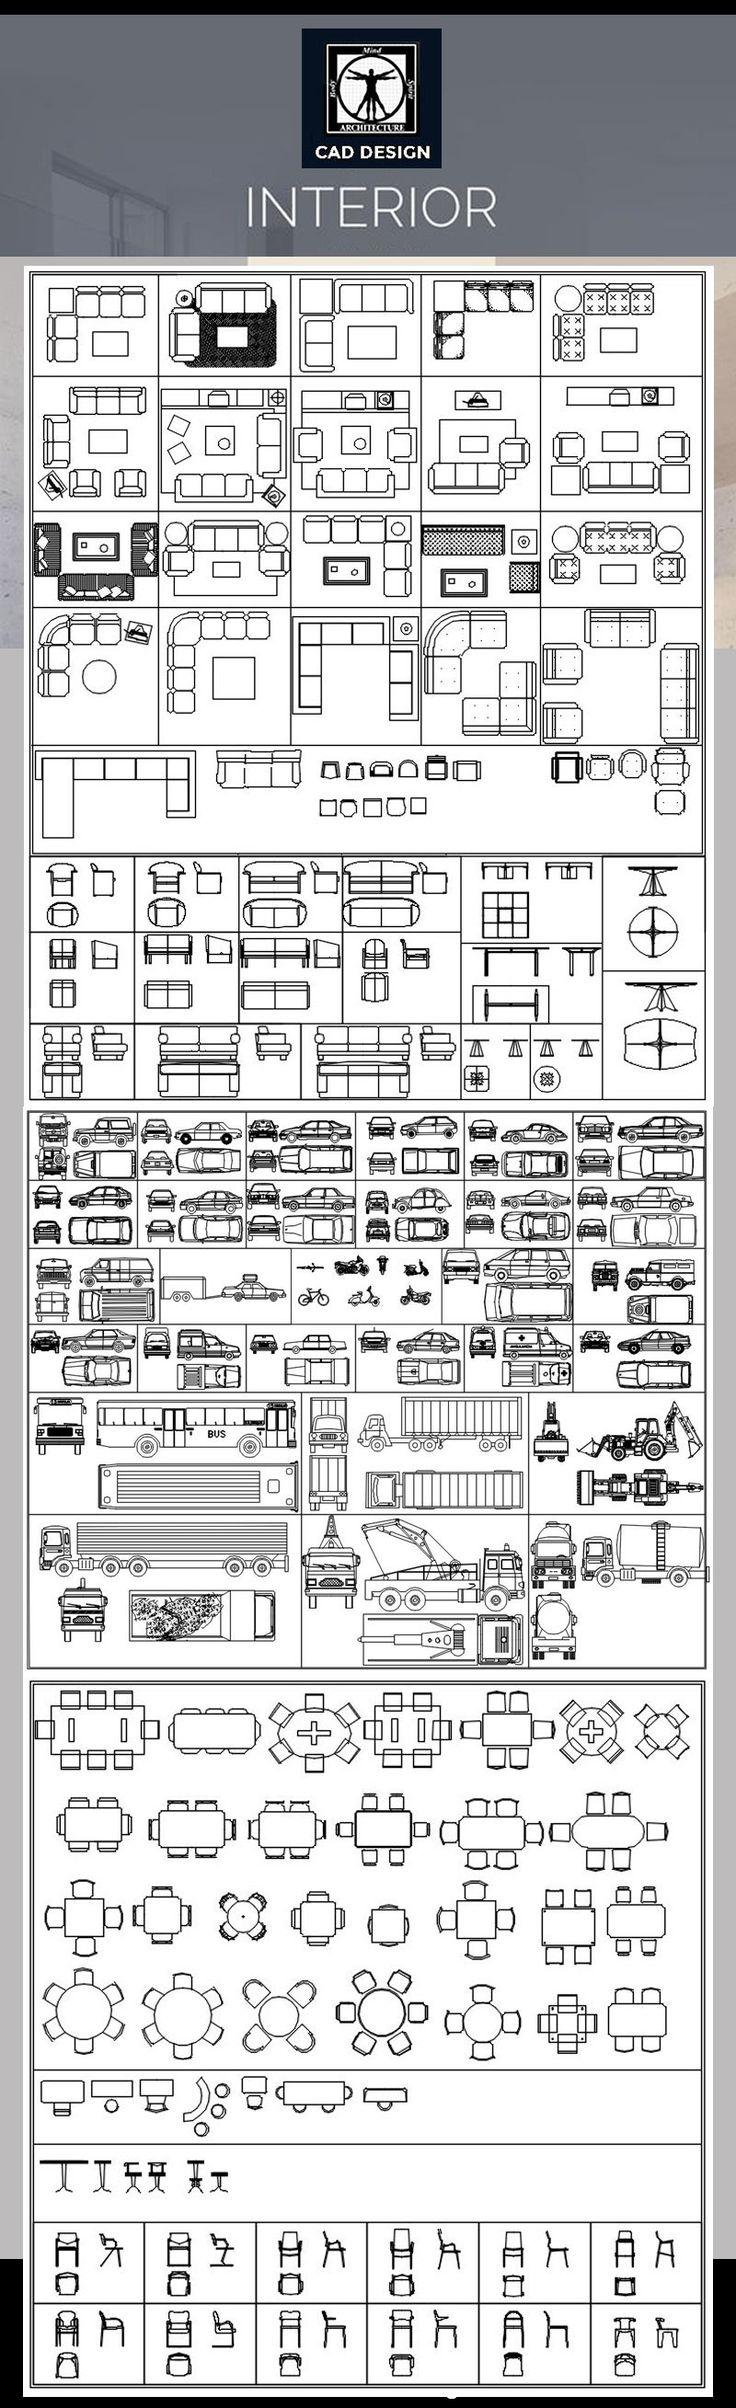 best 20 cad free ideas on pinterest cad blocks autocad free all interior design blocks bundle 4 free cad blocks drawings download center